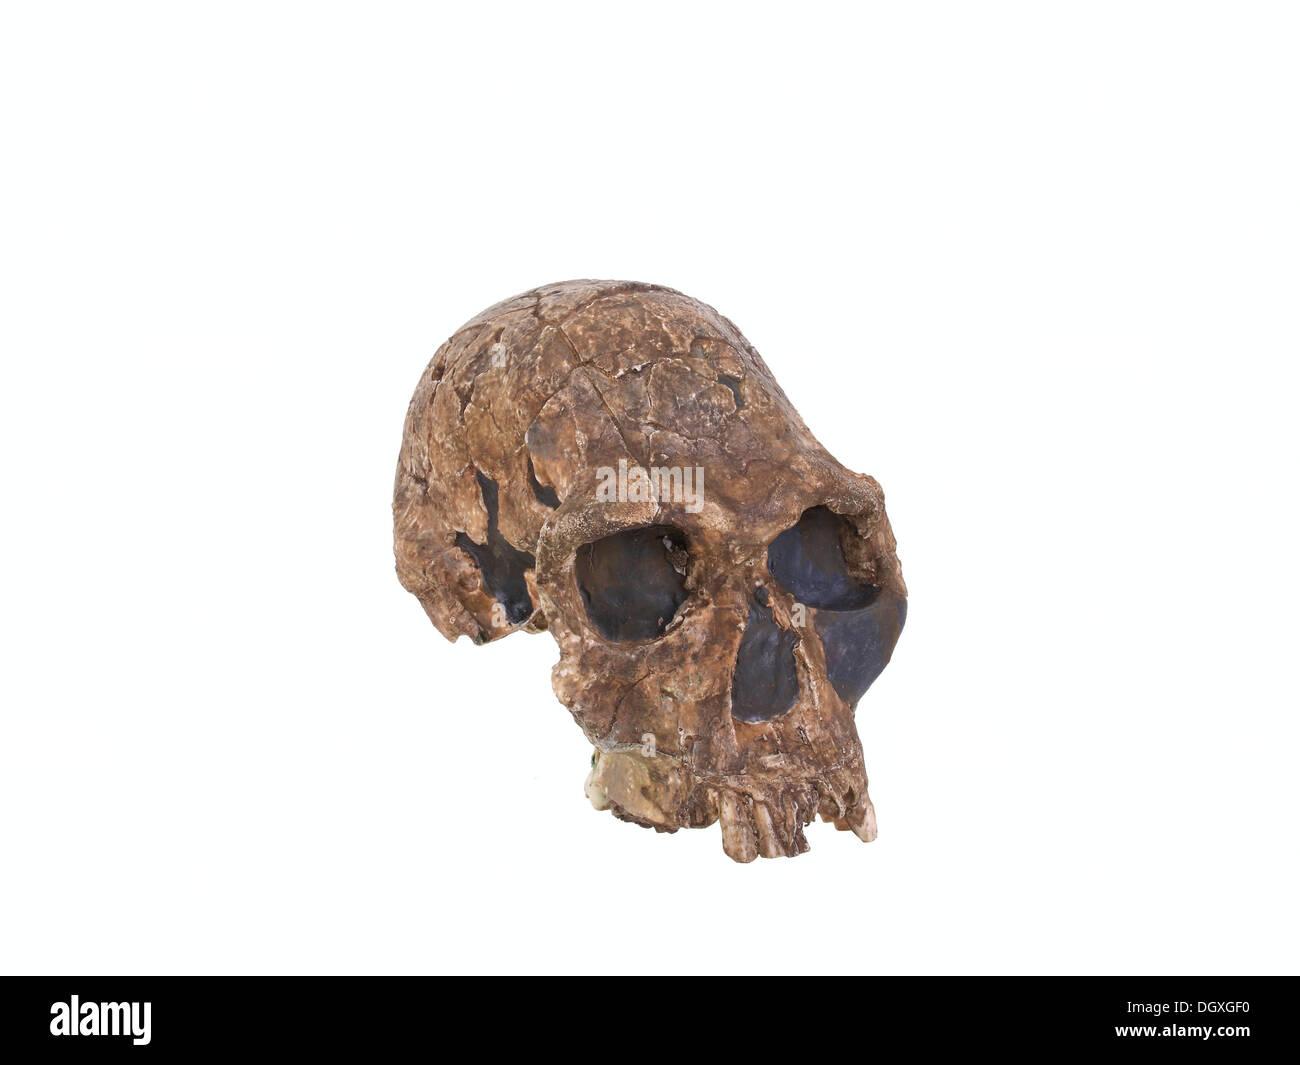 Replica skull of Homo habilis, evolution of human species - Stock Image